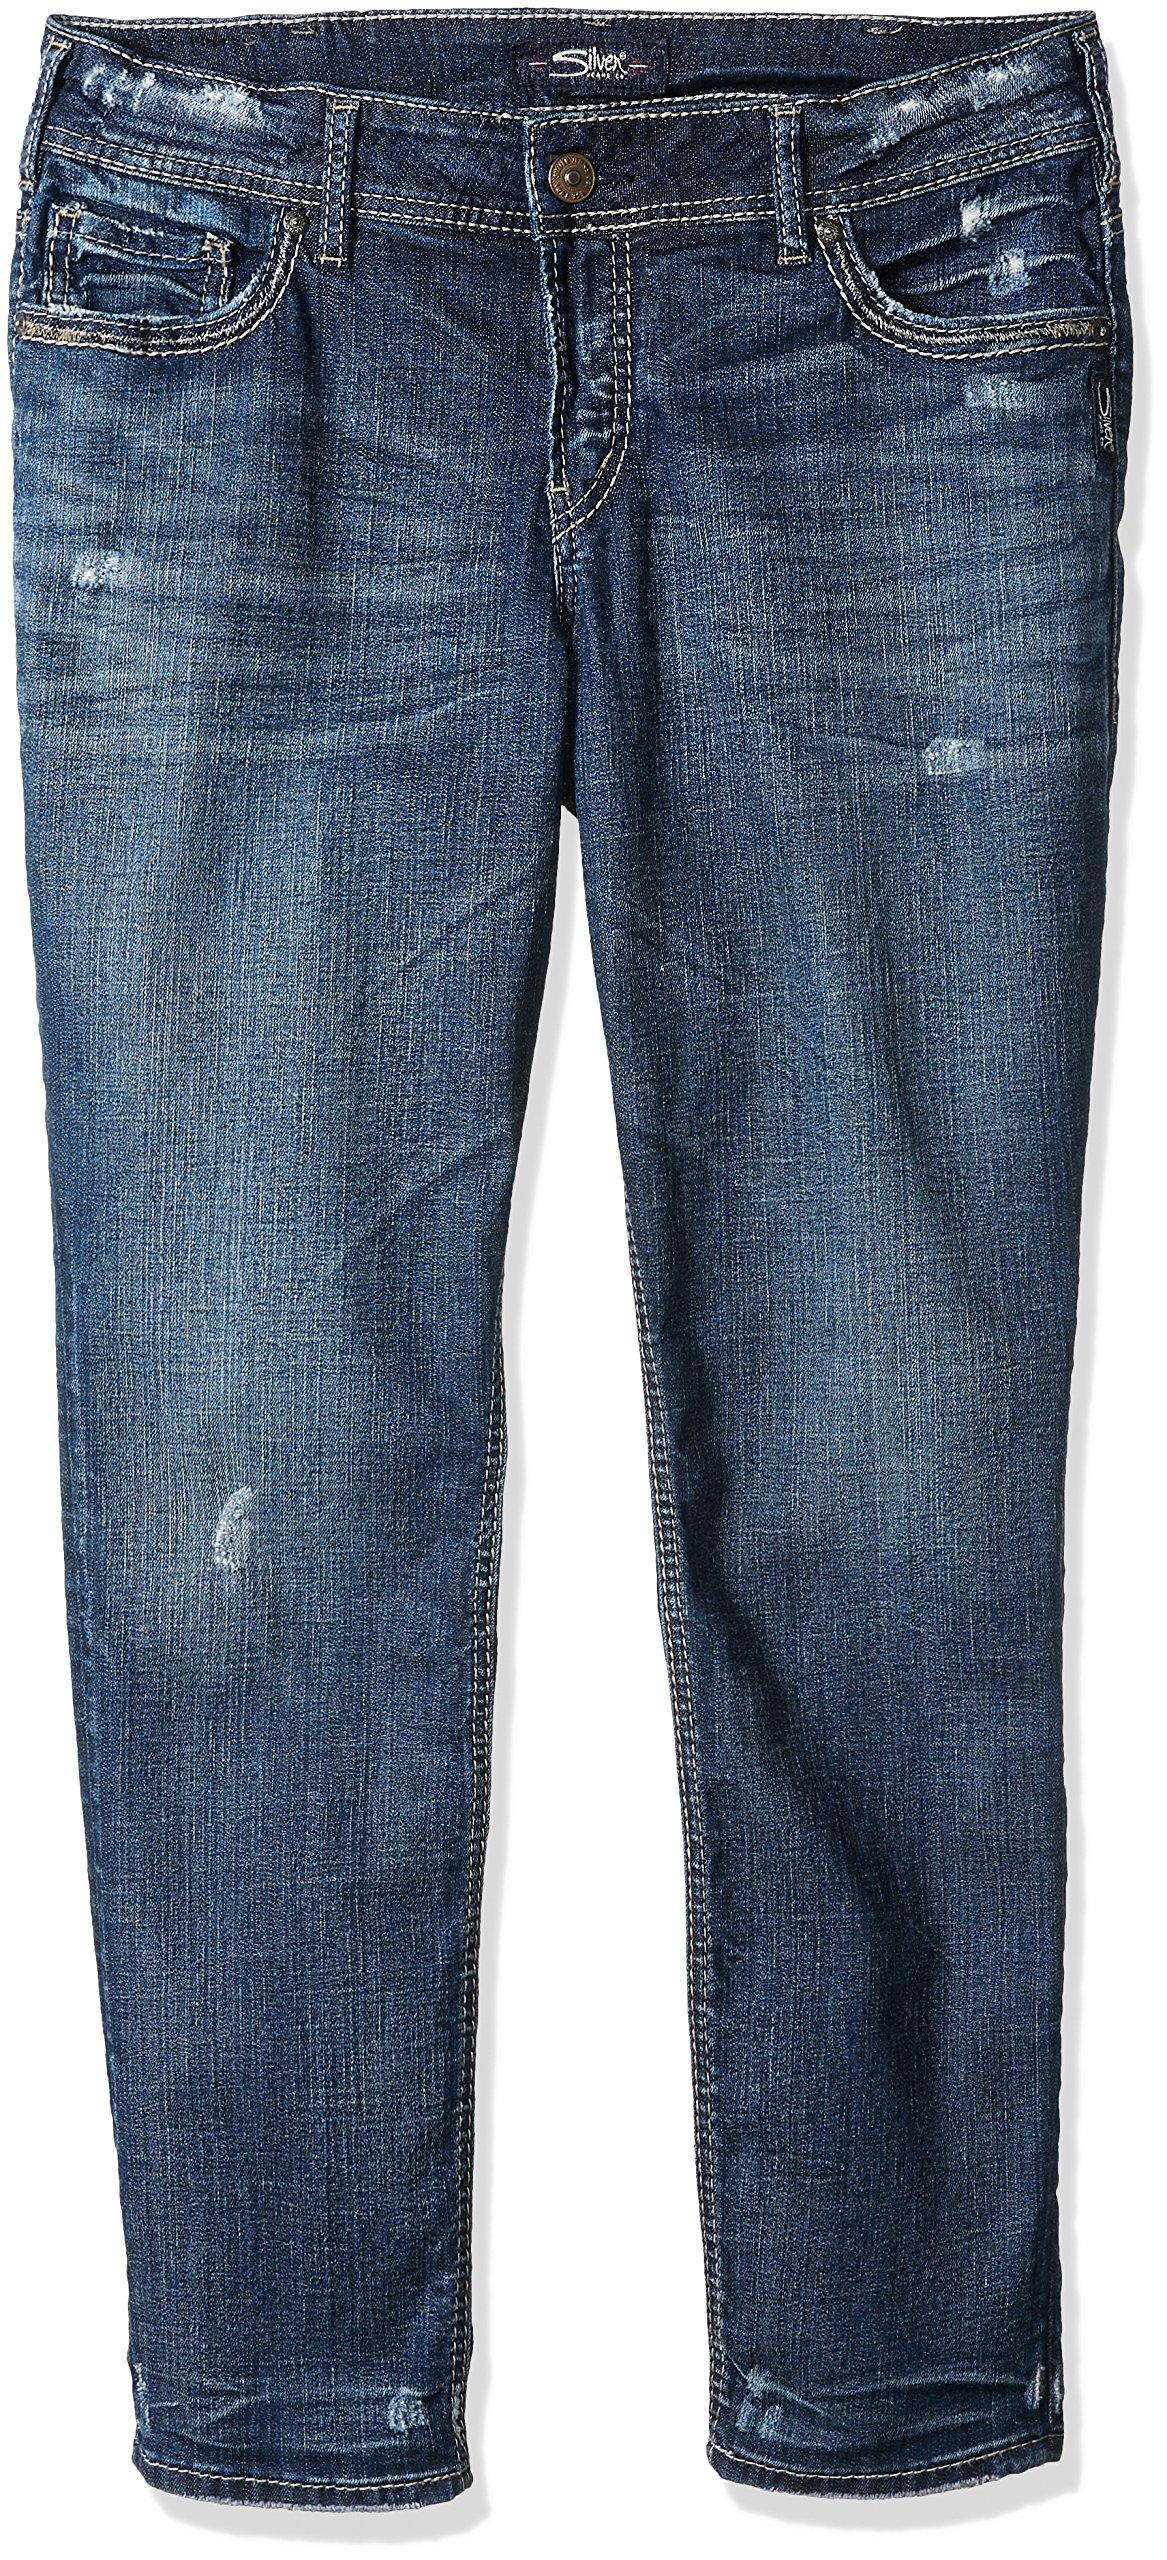 Silver Jeans Women's Plus Size Suki Curvy Fit Mid-Rise Ankle Slim Jeans, Dark Vintage Wash, 18